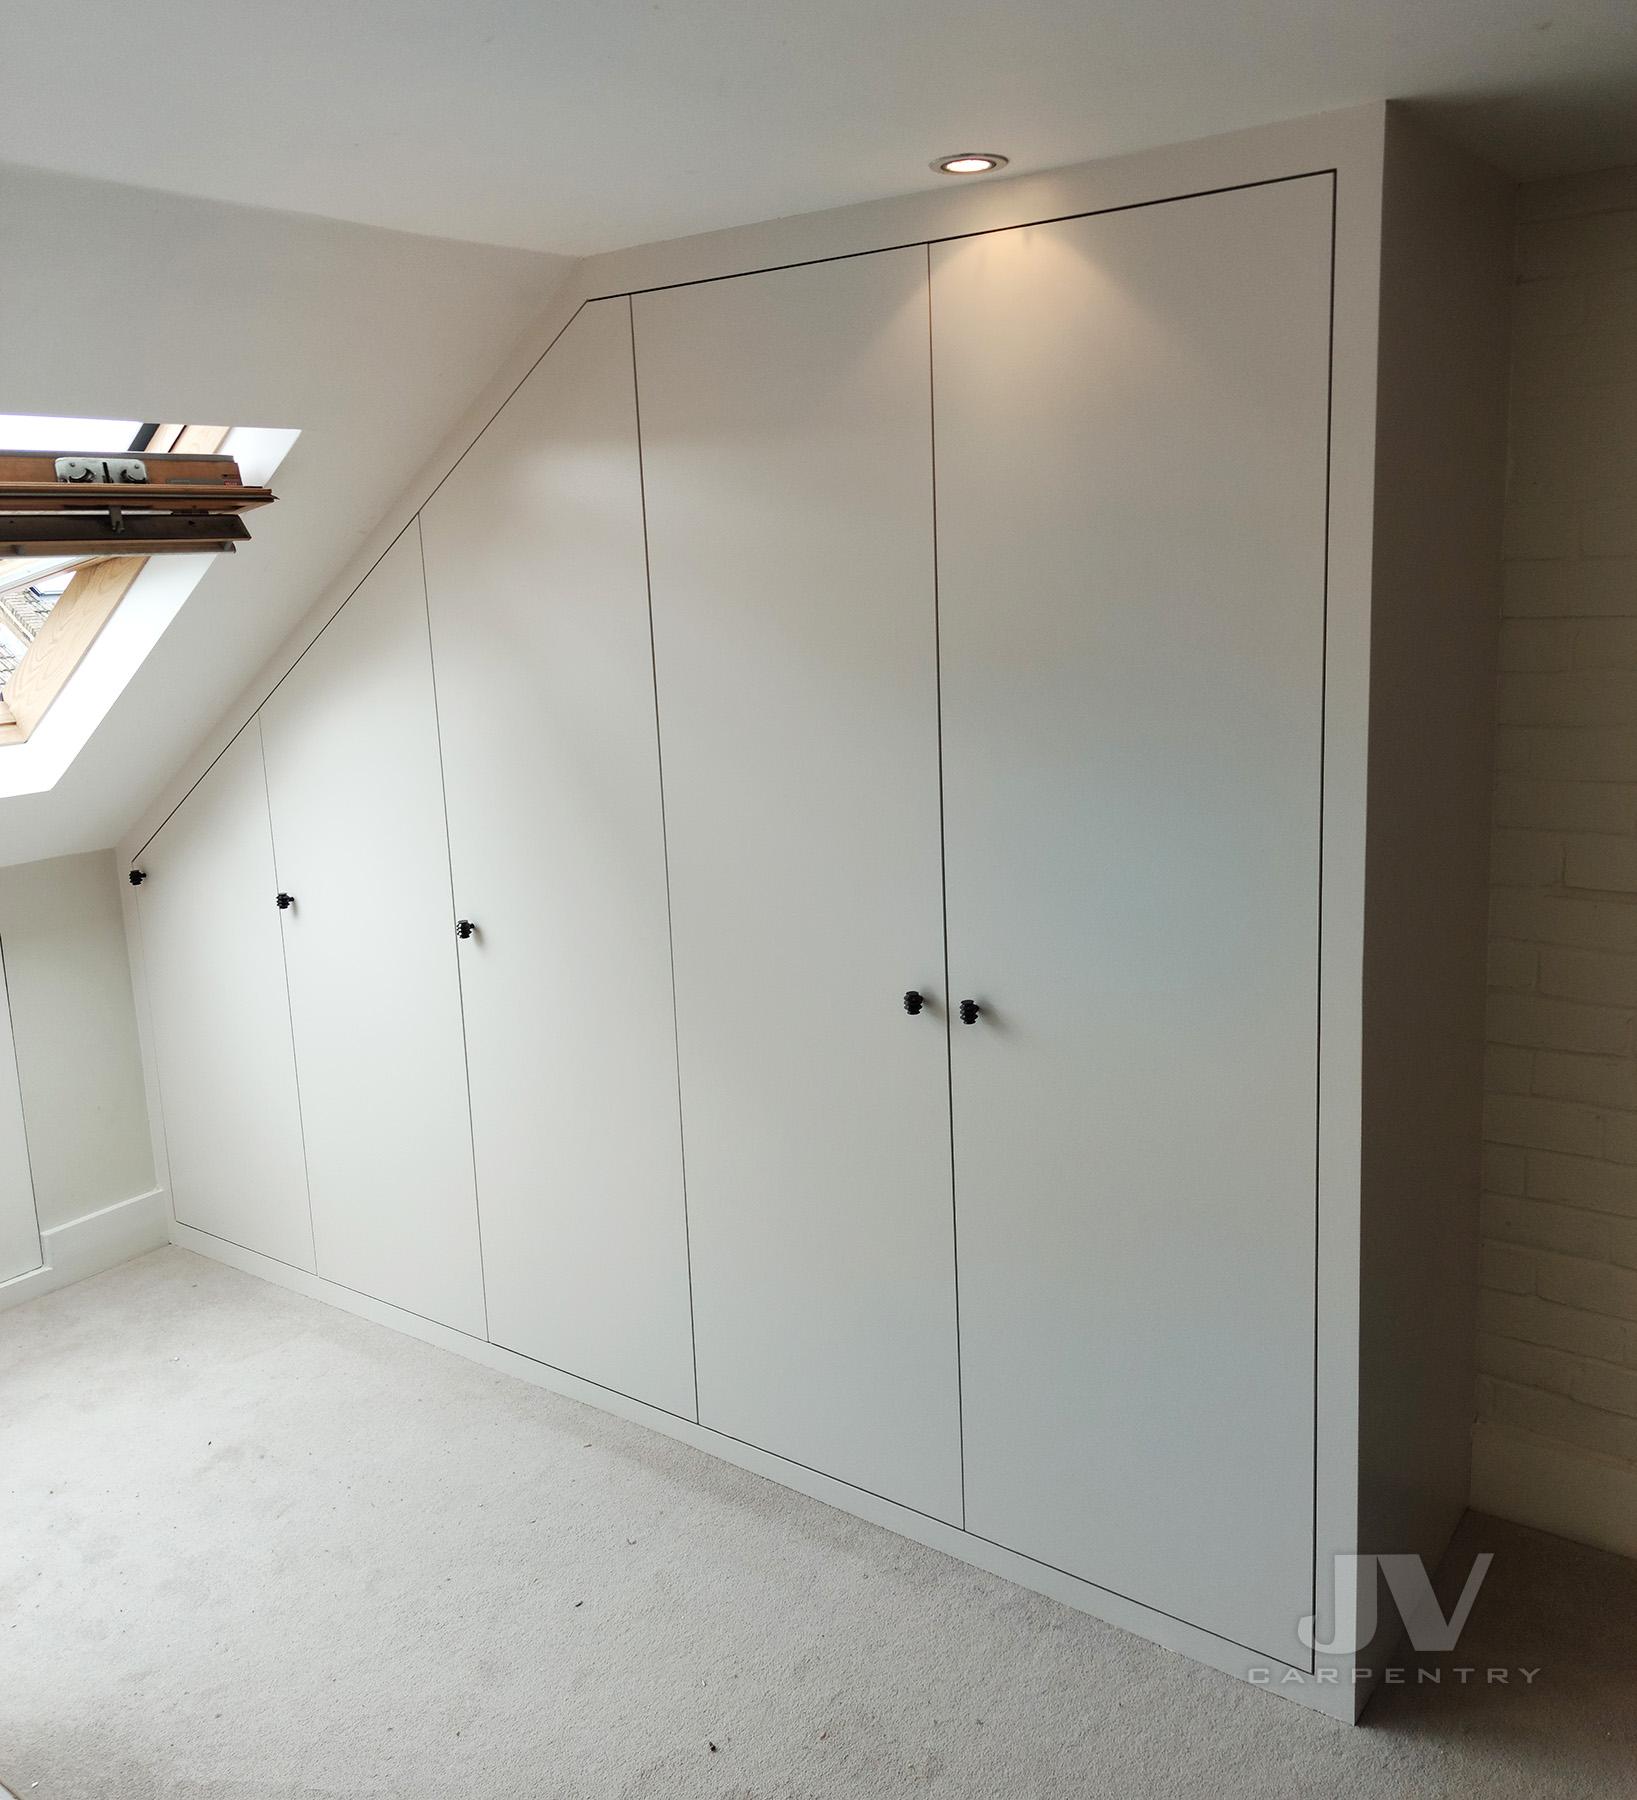 Attic wardrobe under sloping ceiling